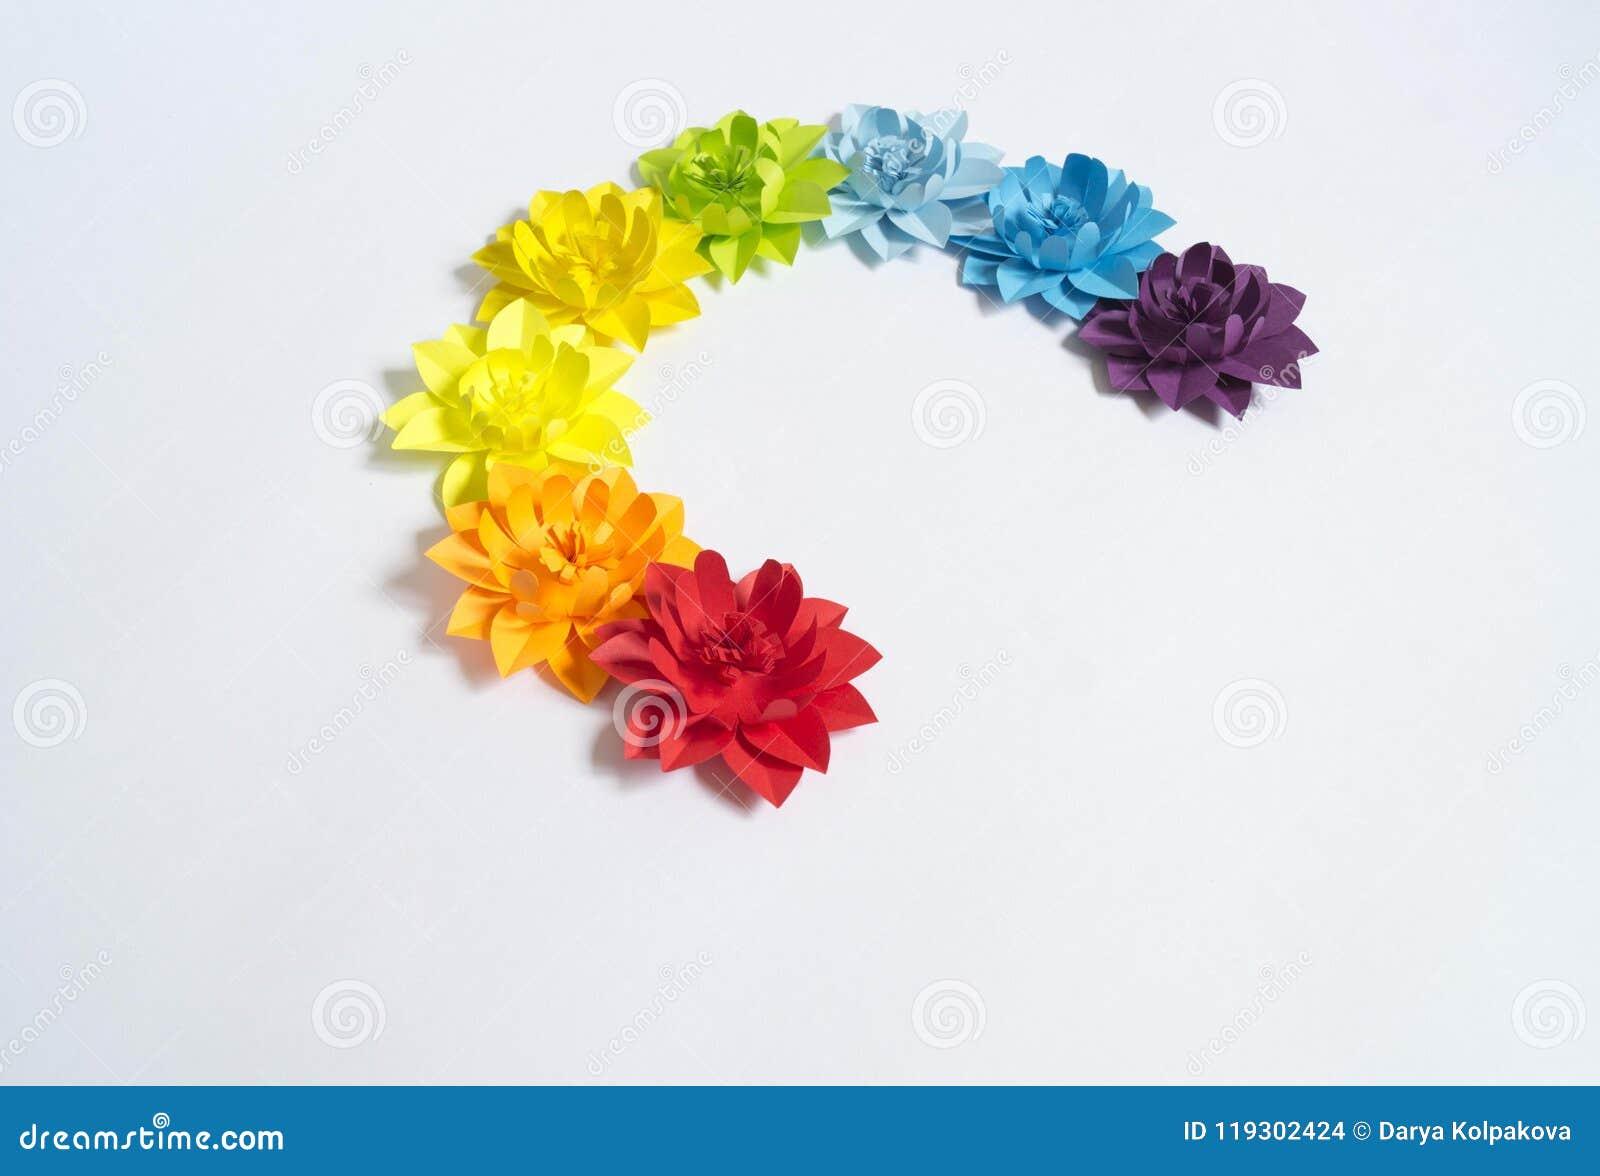 Paper Craft Flower Rainbow Decoration Concept Flat Lay Stock Photo